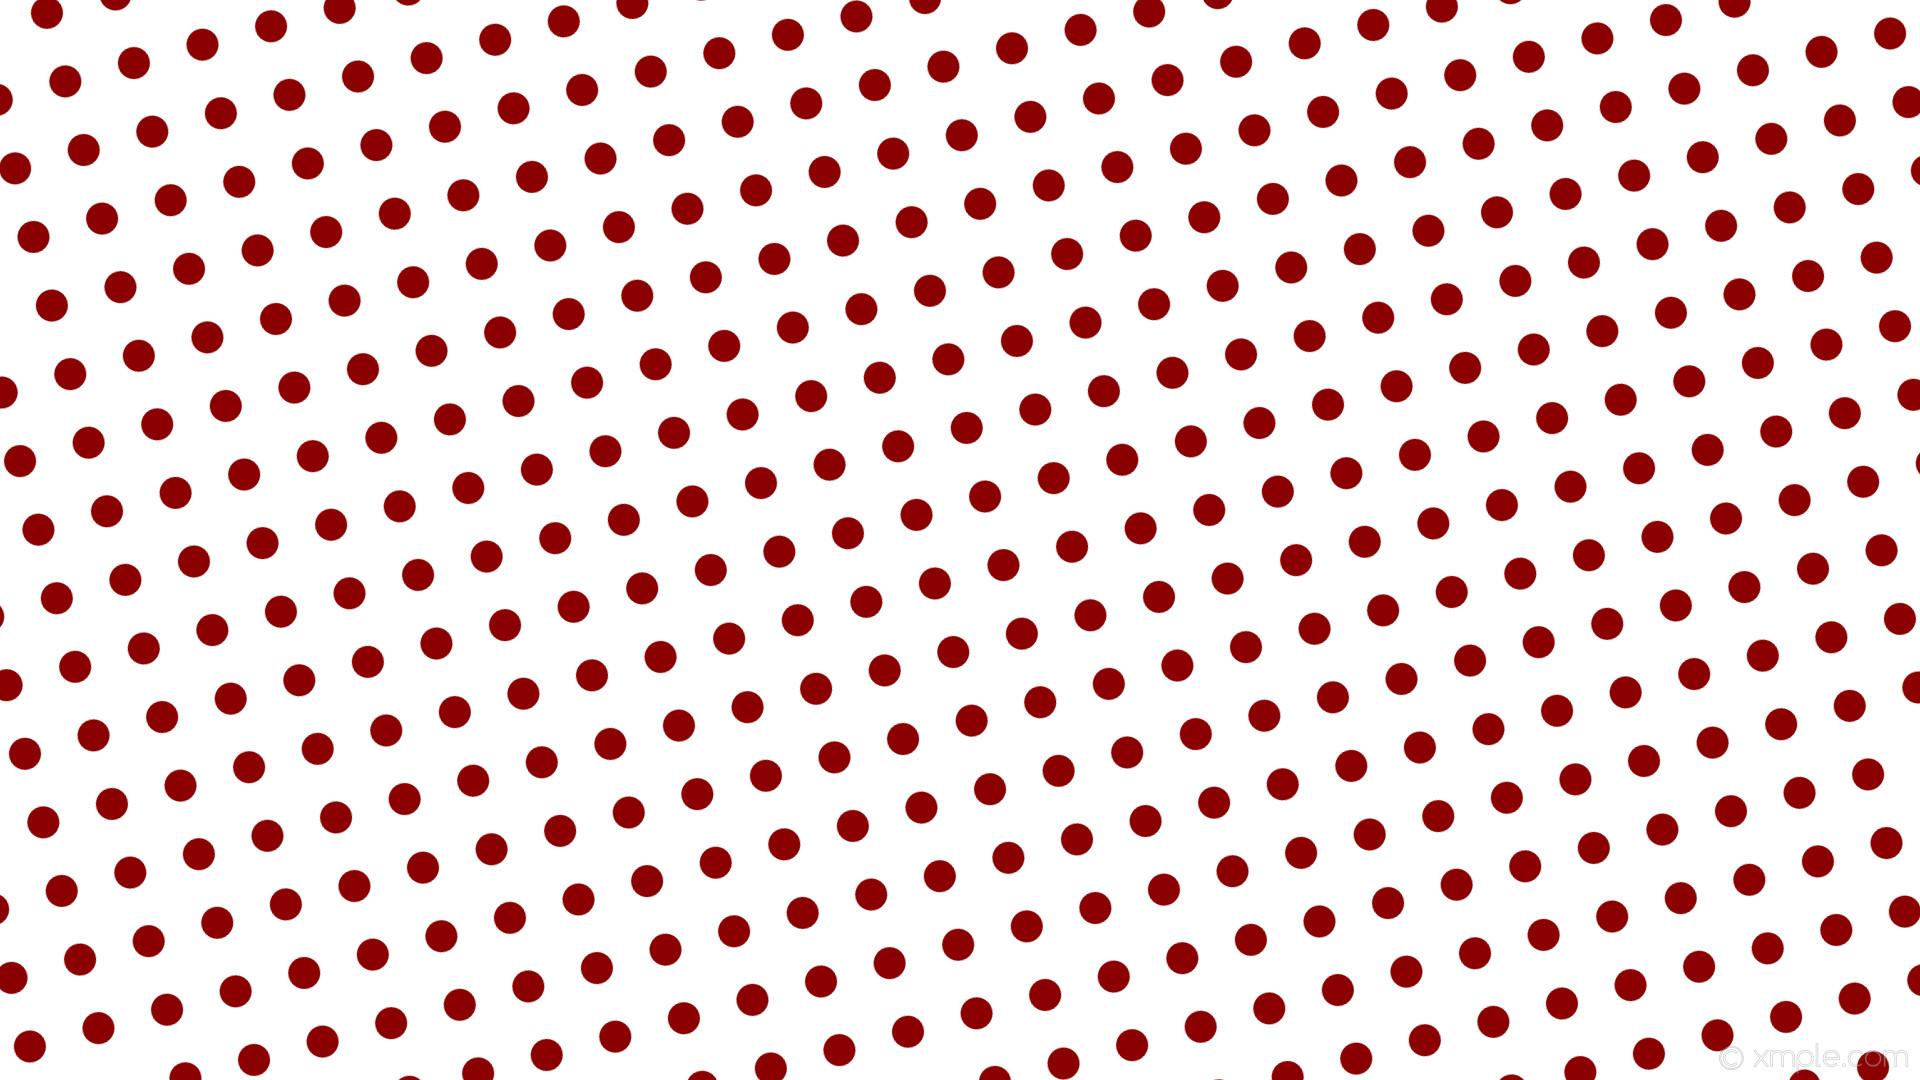 wallpaper red polka dots spots white dark red #ffffff #8b0000 285° 32px 71px